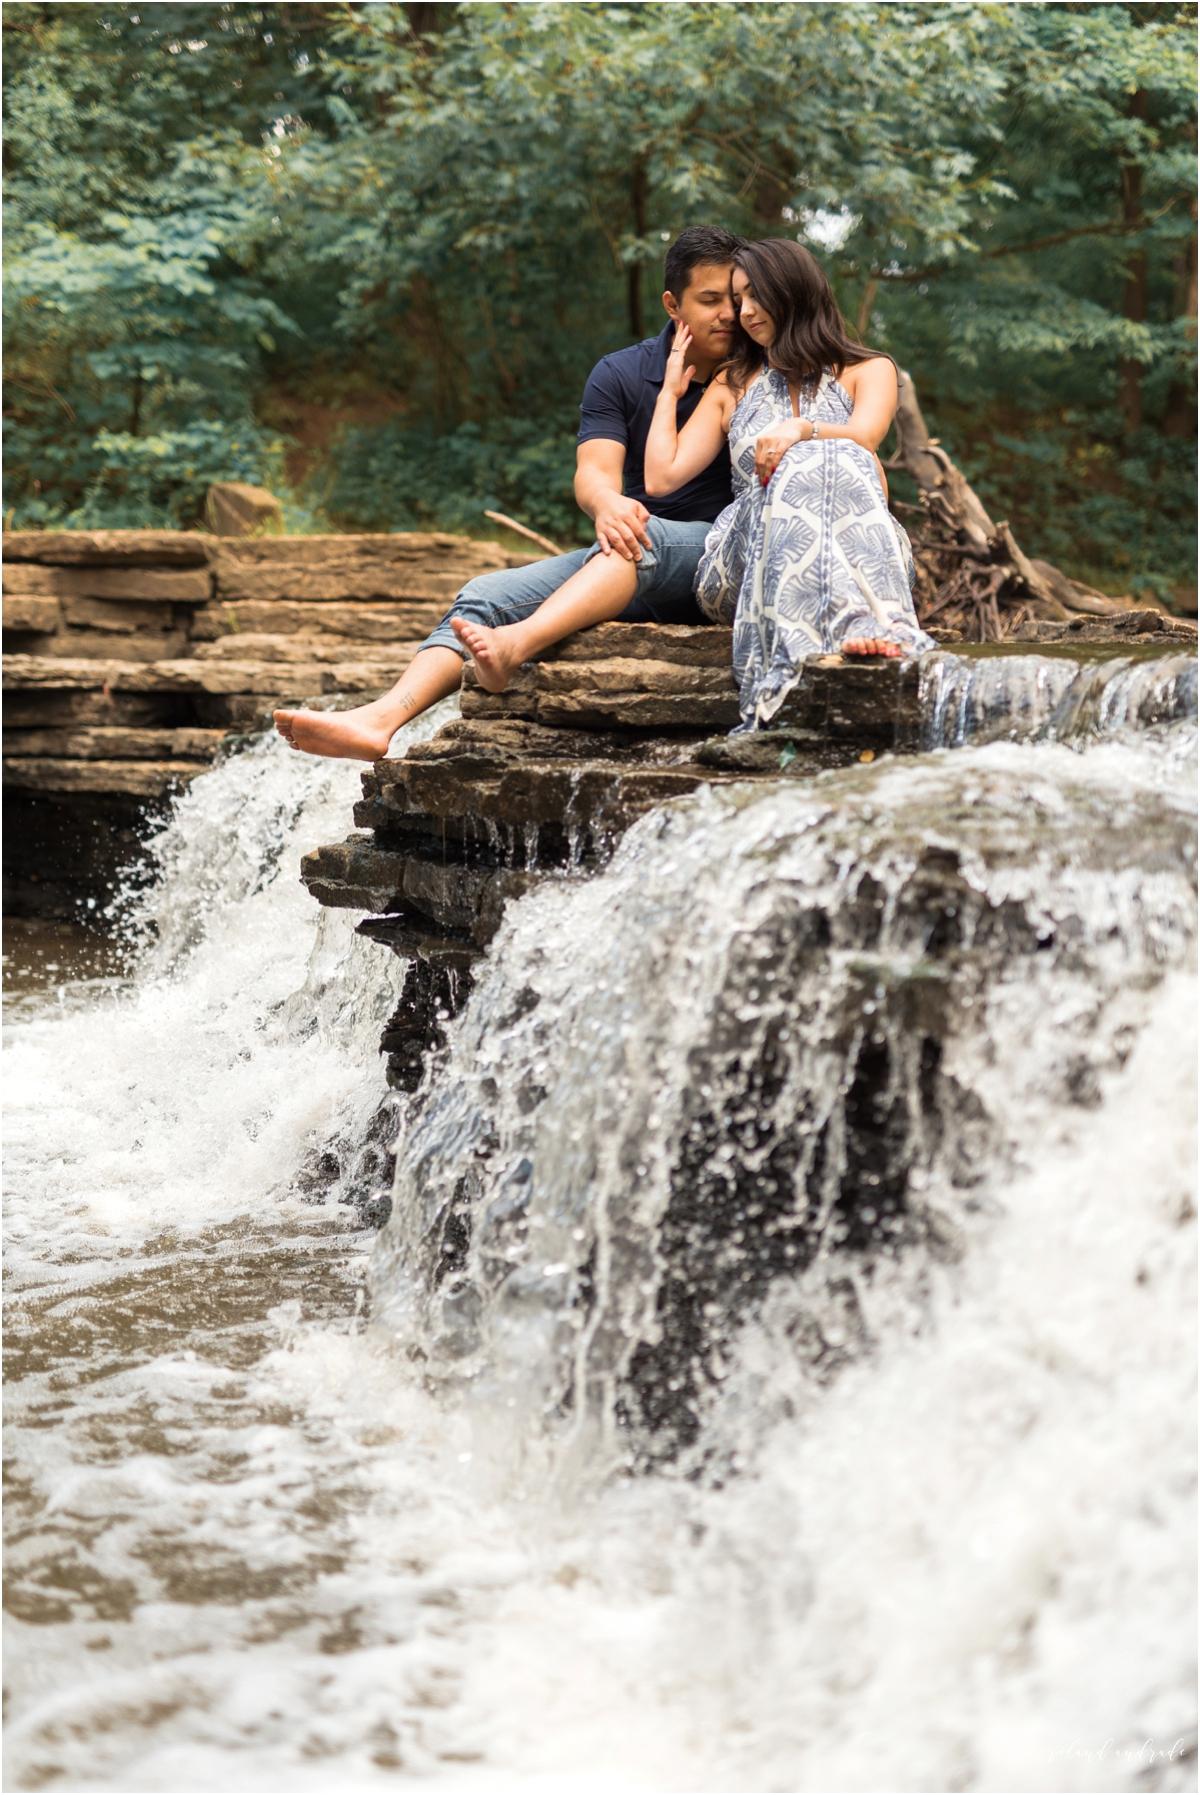 Waterfall Glenn Engagement Session, Lemont Illinois Engagement Session, Chicago Wedding Photographer, Naperville Wedding Photographer, Aurora Wedding Photographer34.jpg